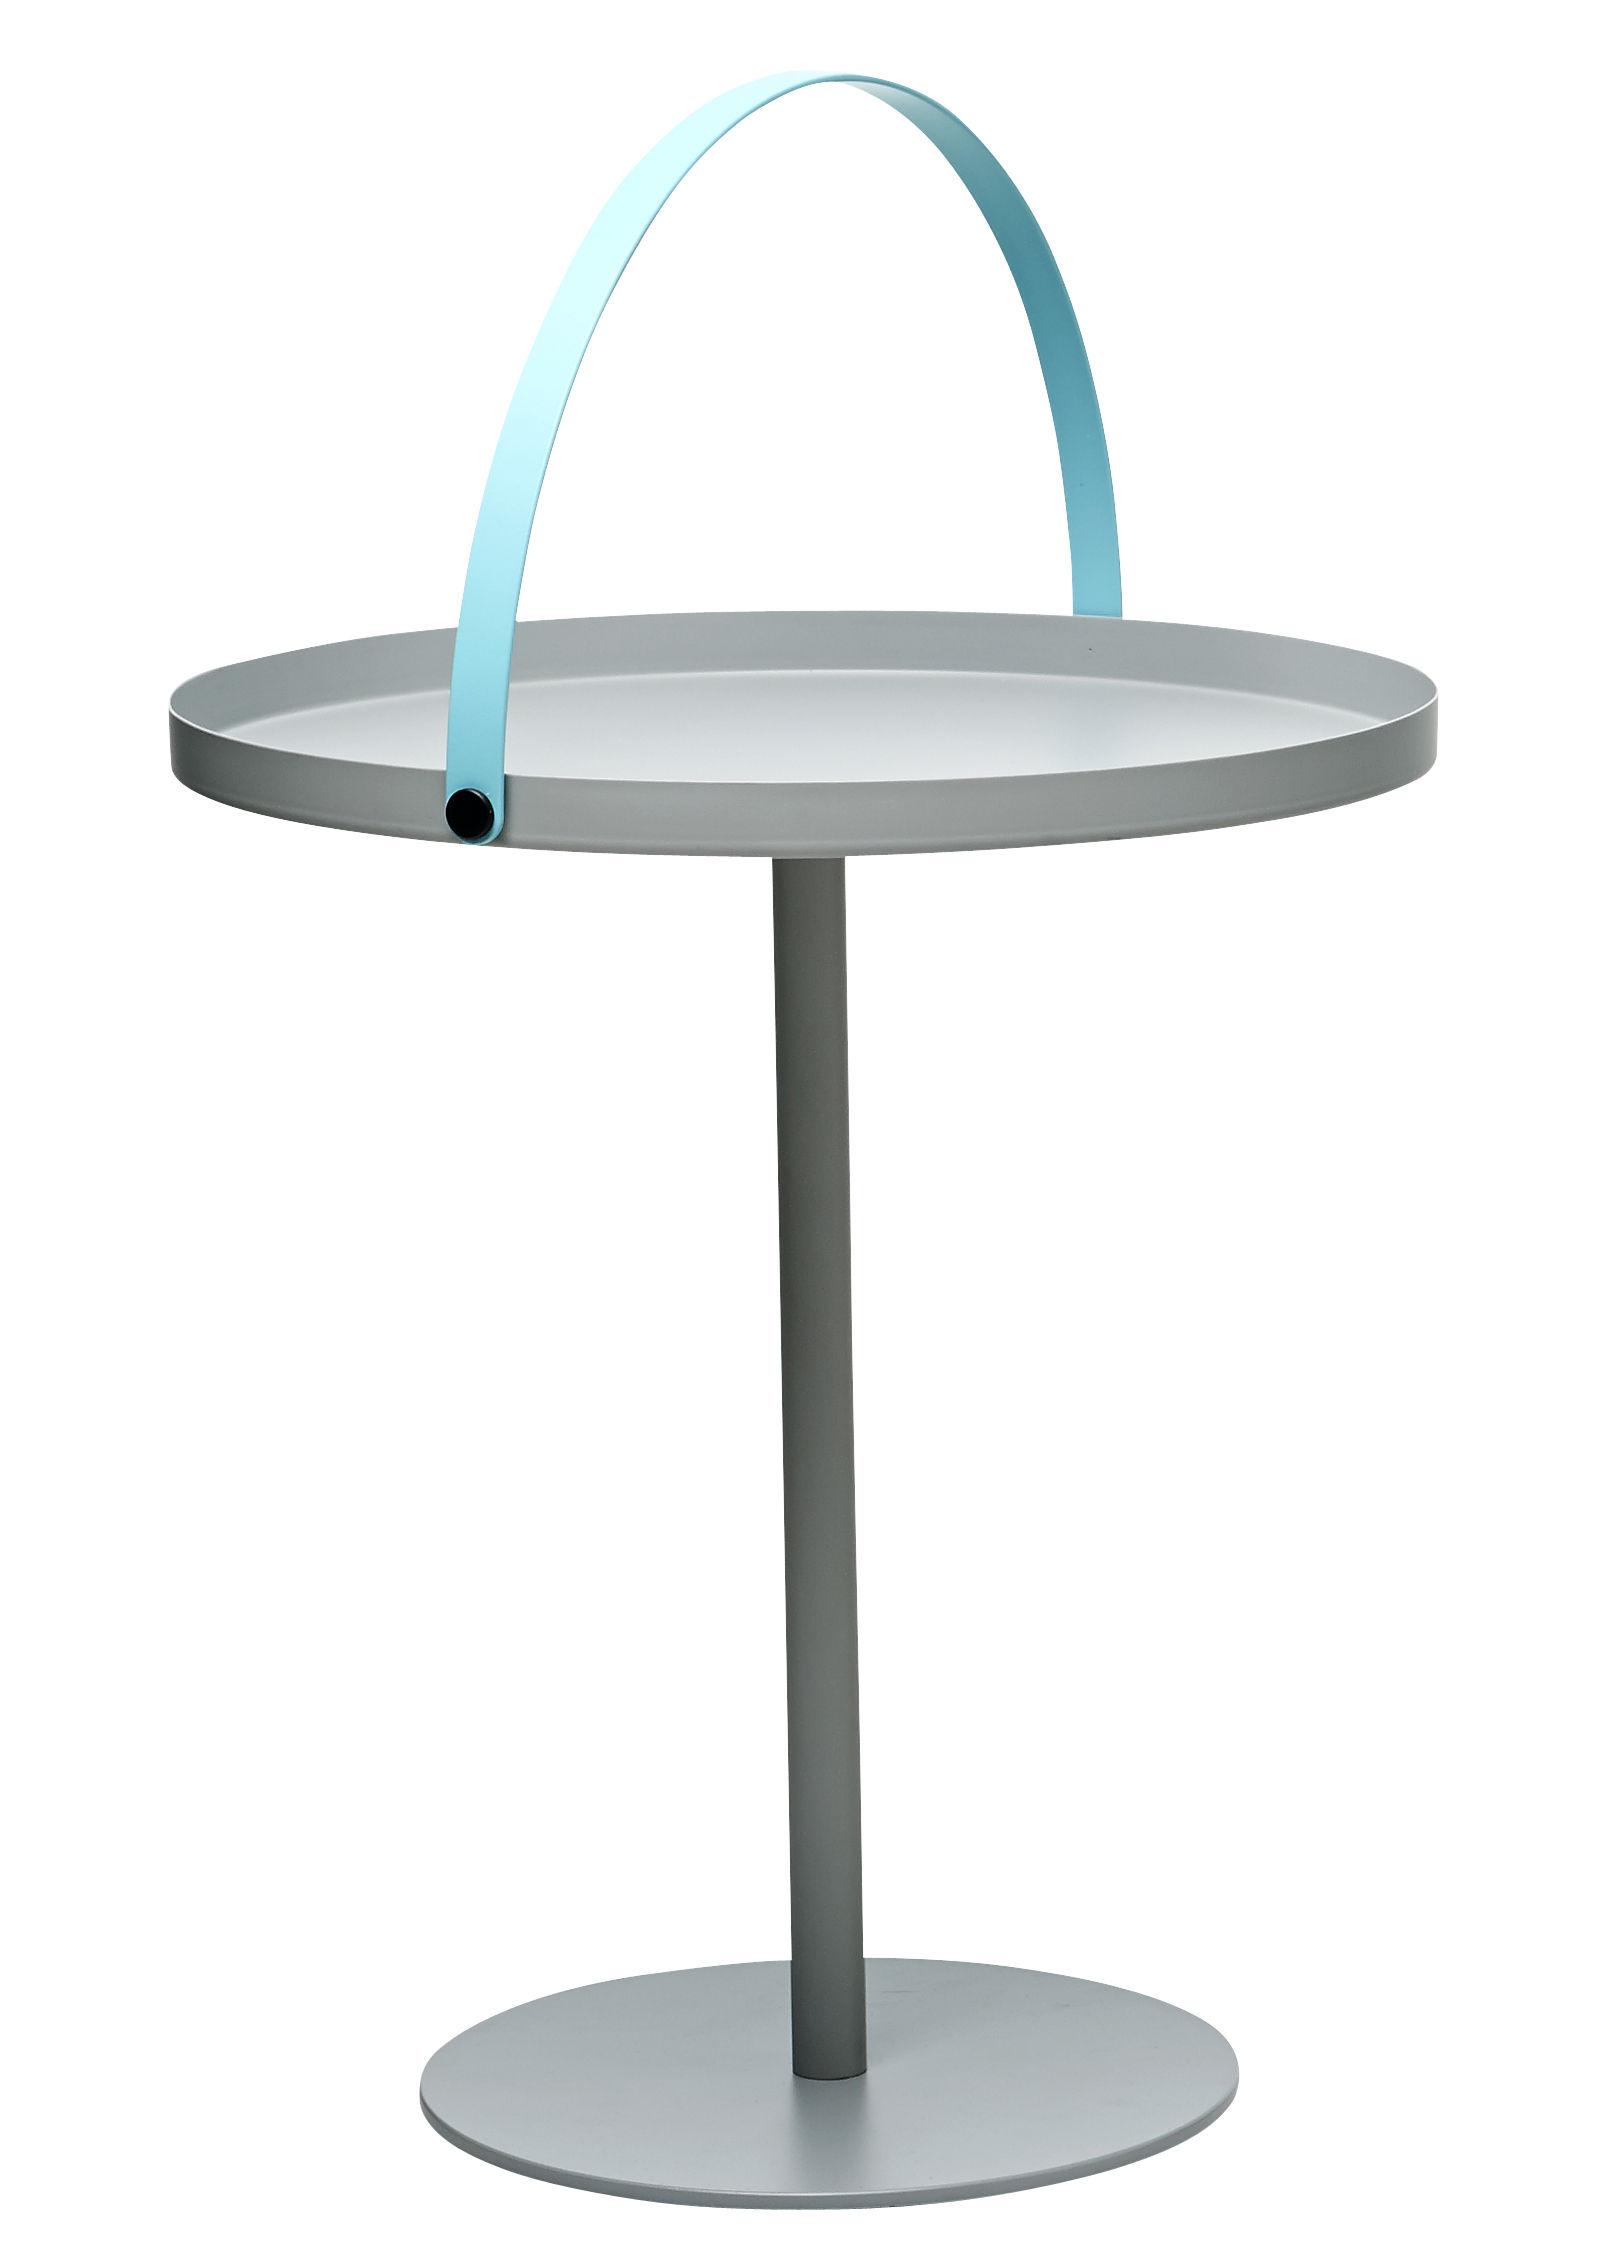 table basse to go poign e int gr e h 48 cm gris poign e turquoise design letters. Black Bedroom Furniture Sets. Home Design Ideas